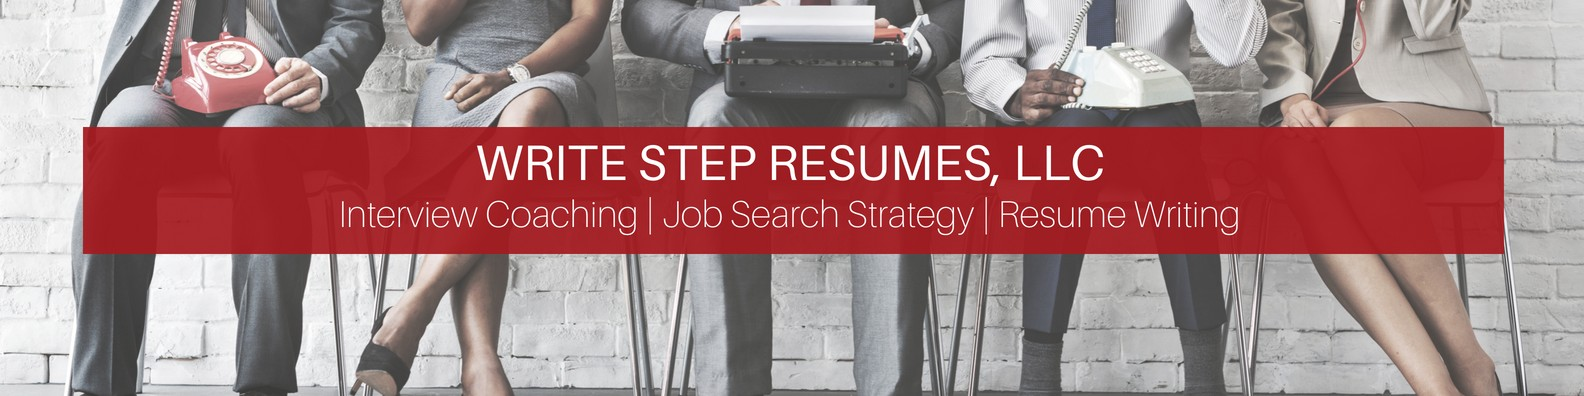 Write Step Resumes Llc Linkedin